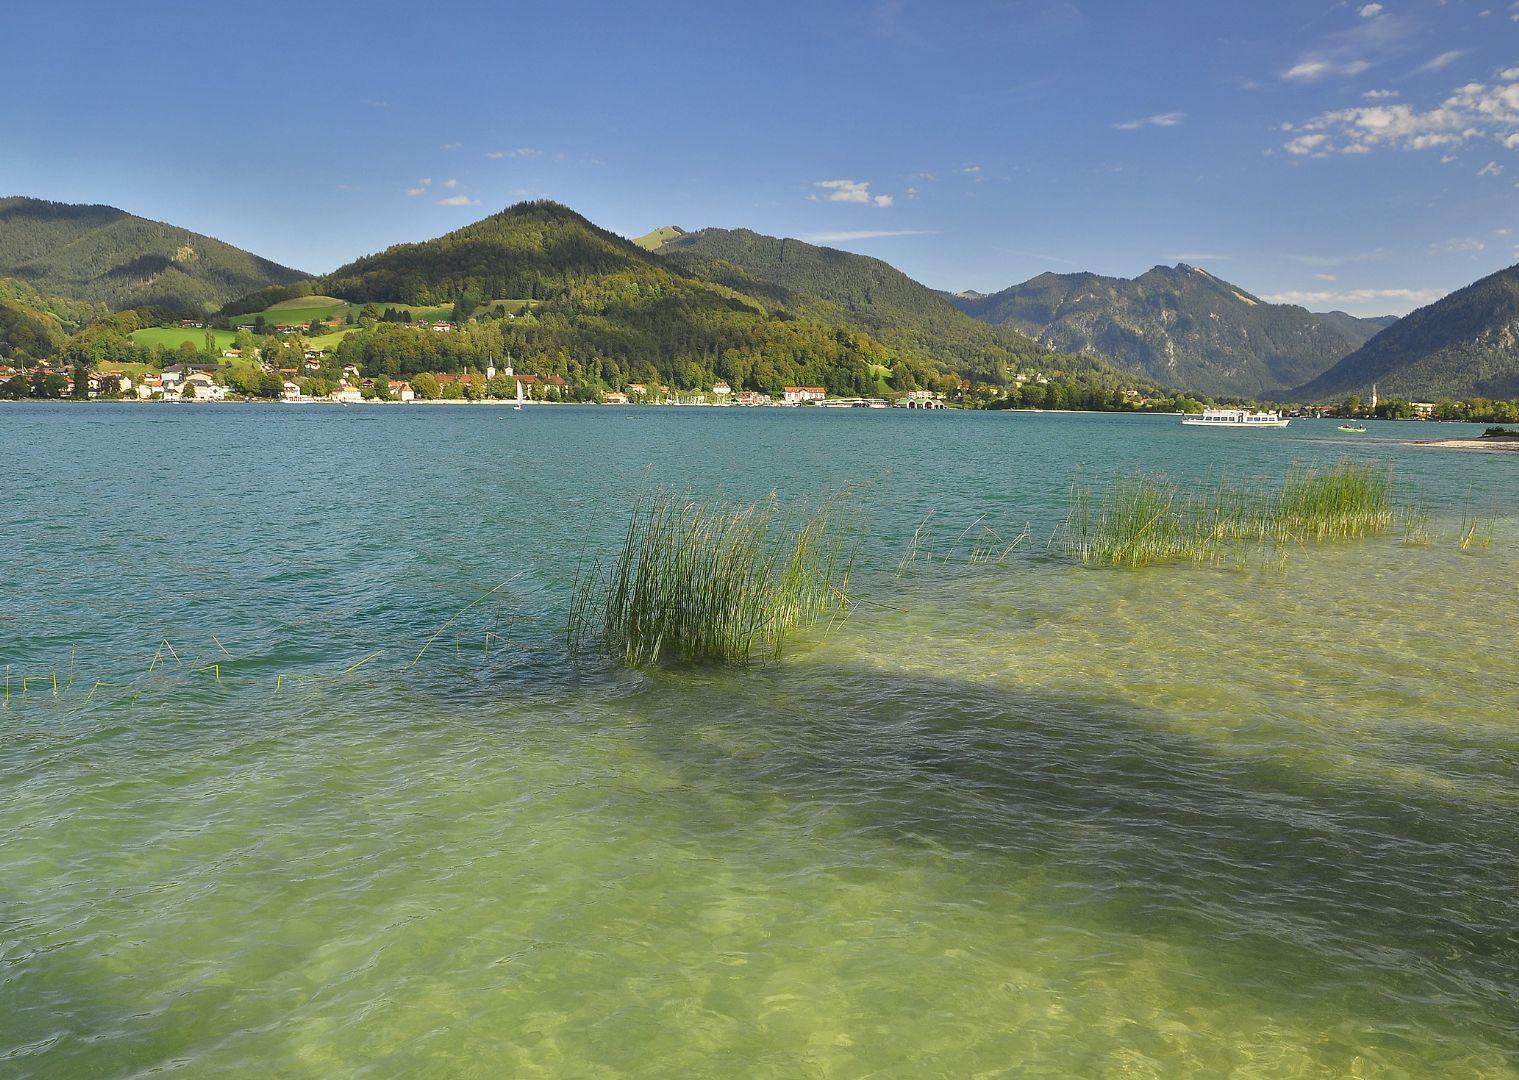 leisurecyclingbavaria3.jpg - Germany - Bavarian Lakes - Self-Guided Leisure Cycling Holiday - Leisure Cycling